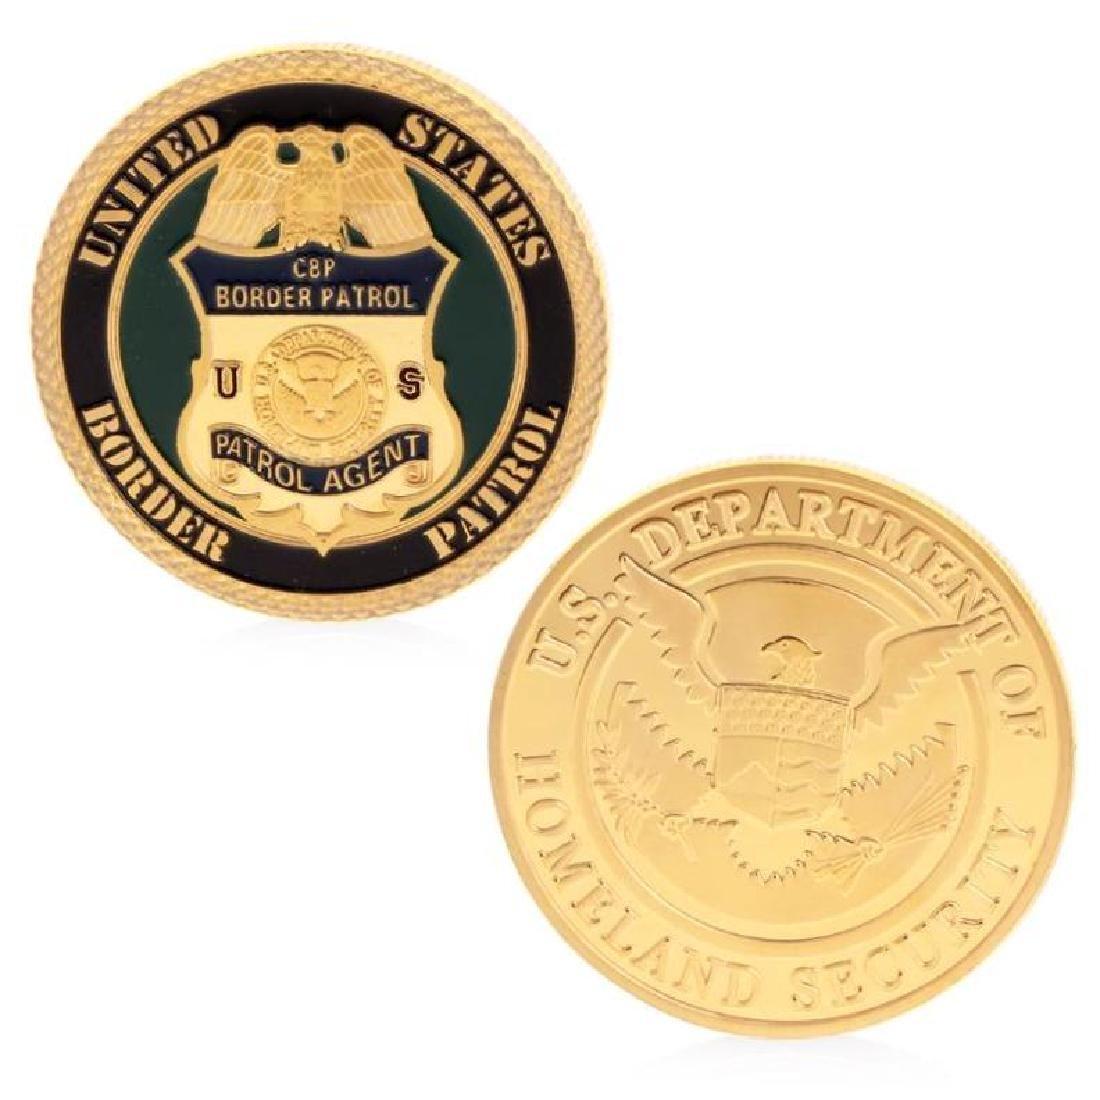 USA Homeland Security Gold Clad Coin